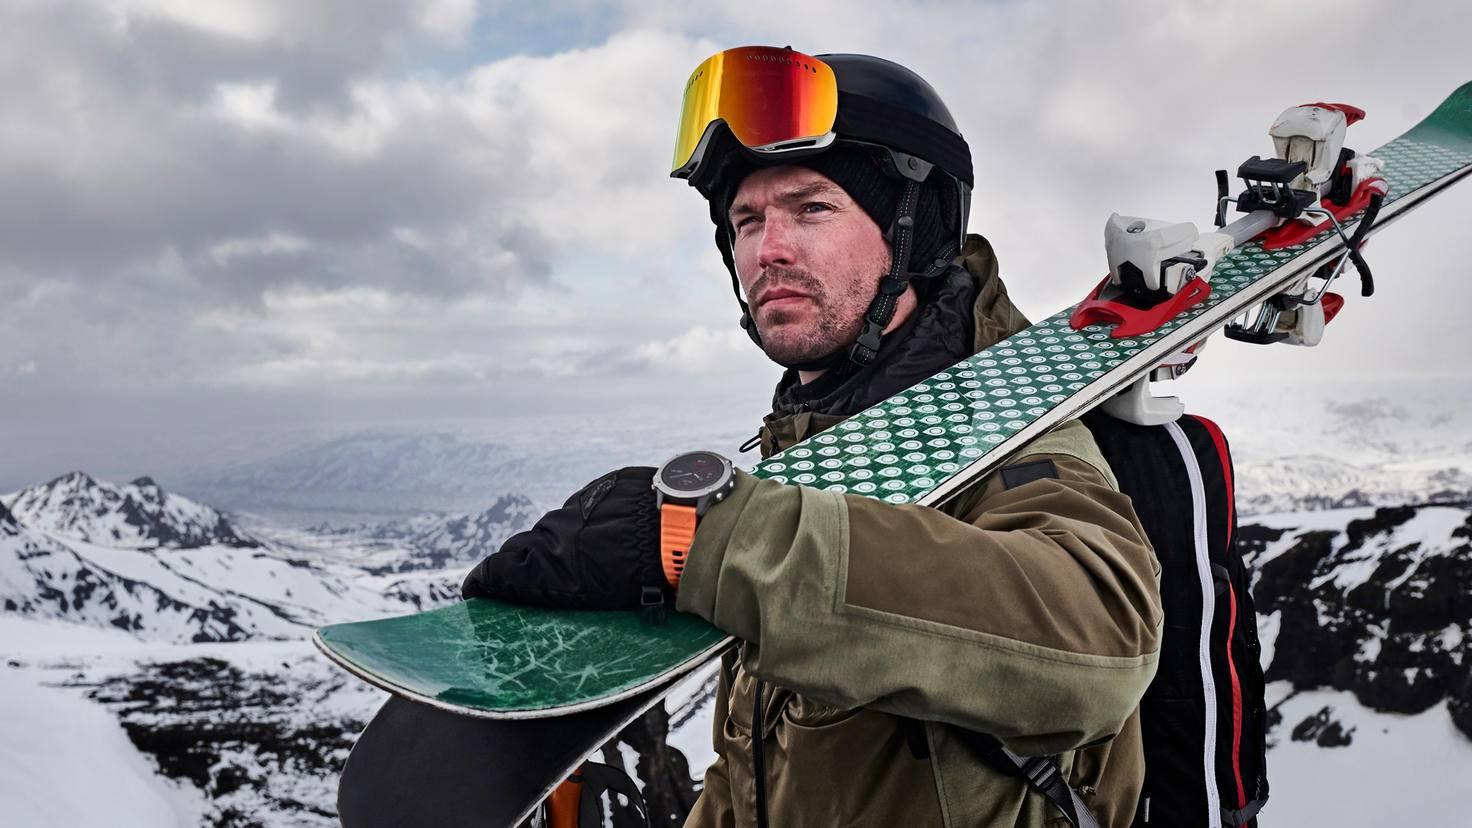 Garmin Fenix 6 Serie mann skier